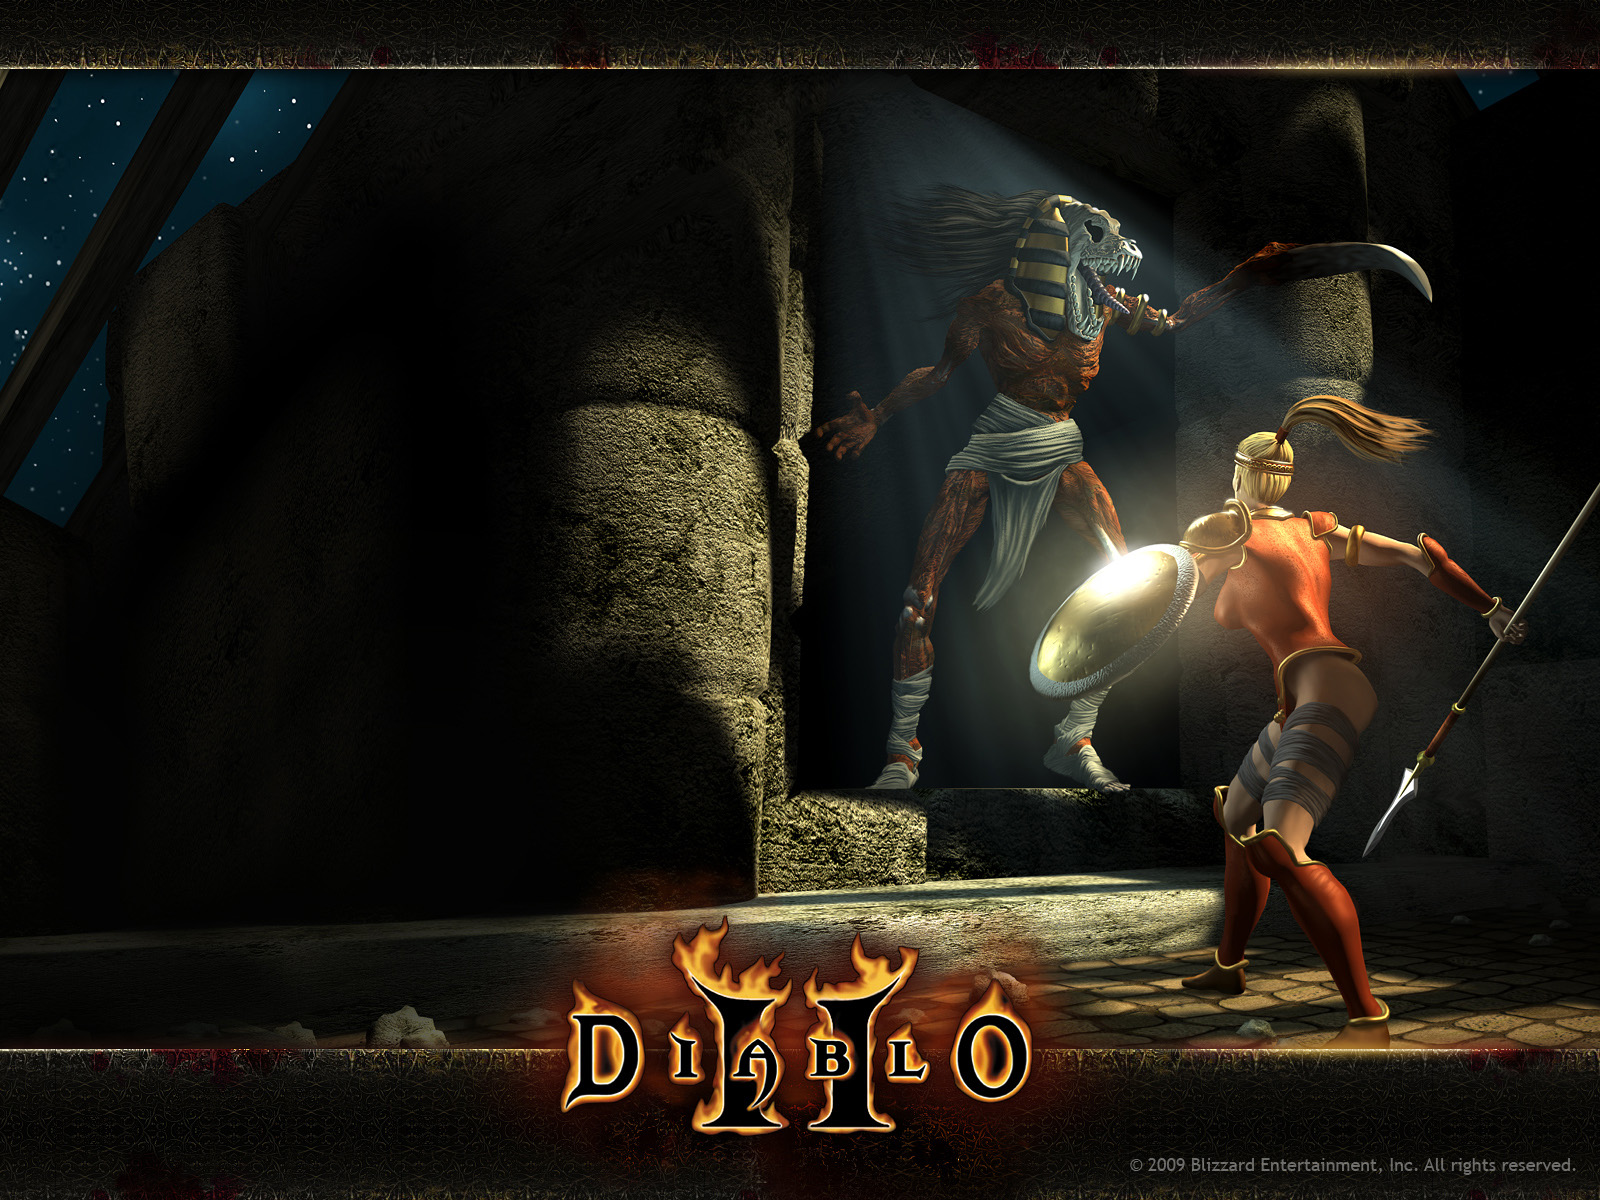 Blizzard EntertainmentDiablo 2 1600x1200